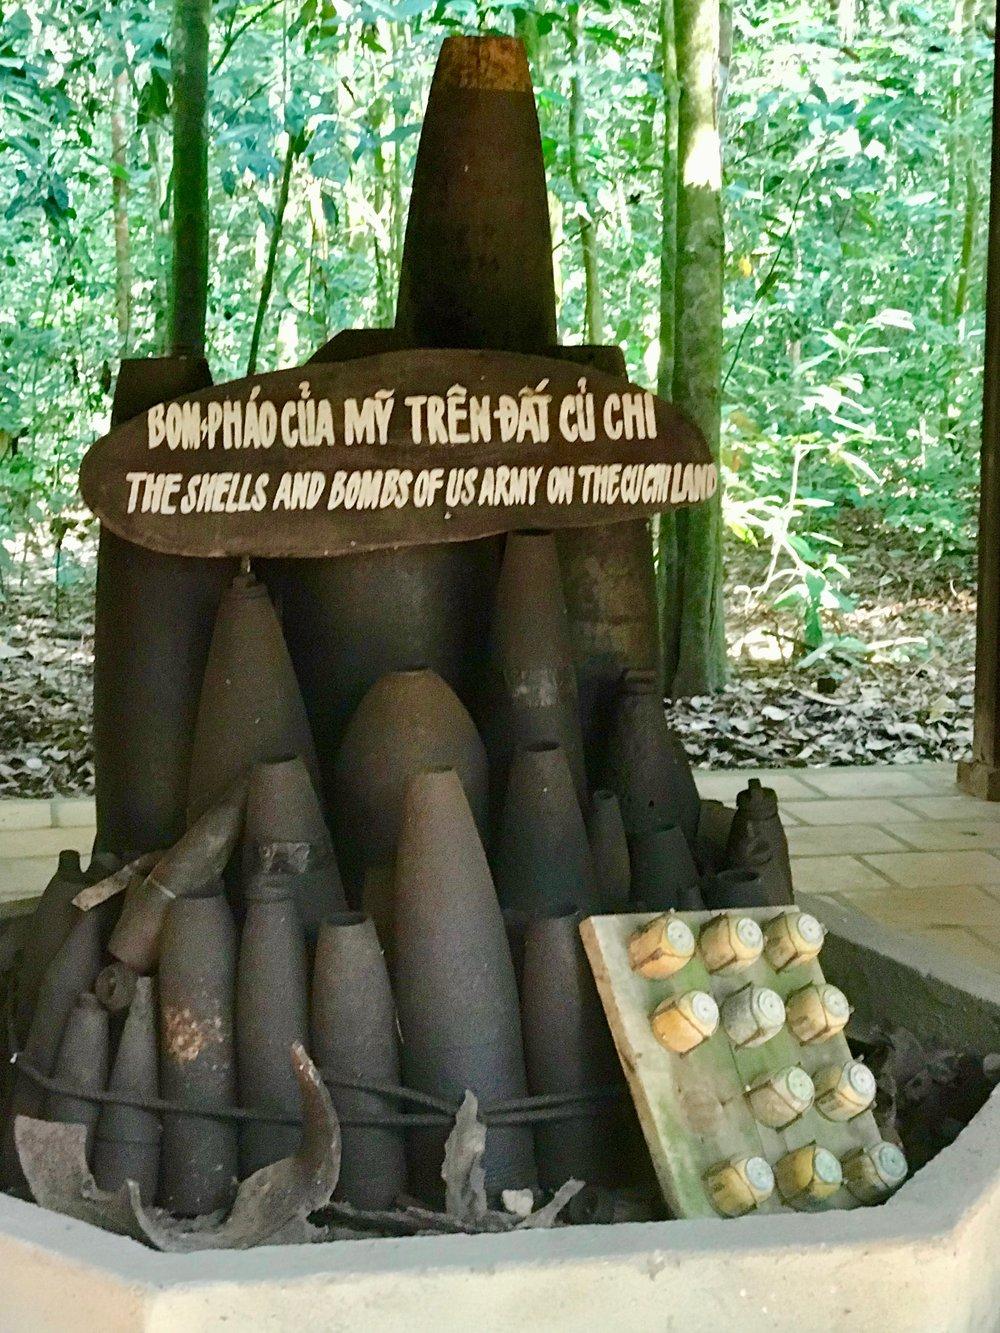 Shells & Bombs US army.jpg